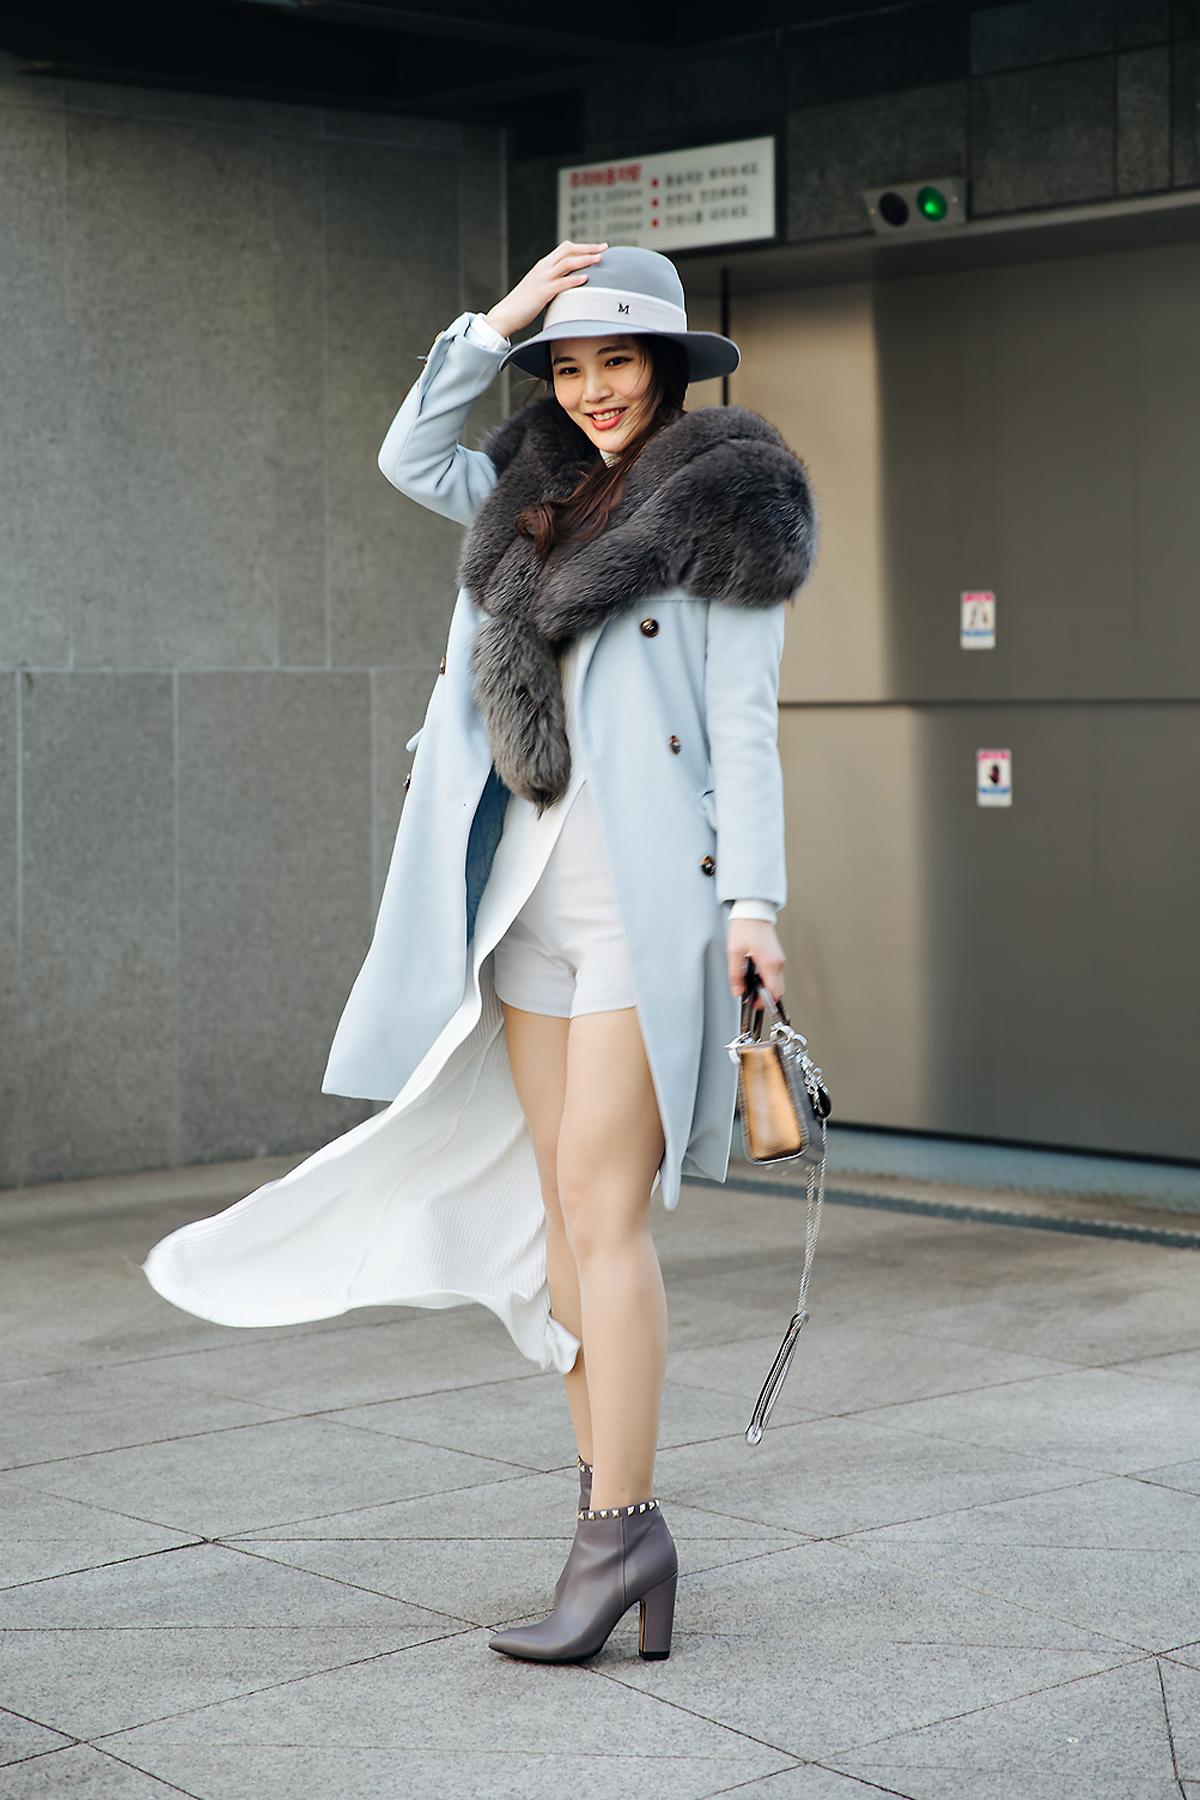 Gam Pukdeetanakul, Street style women winter 2017-2018 inseoul